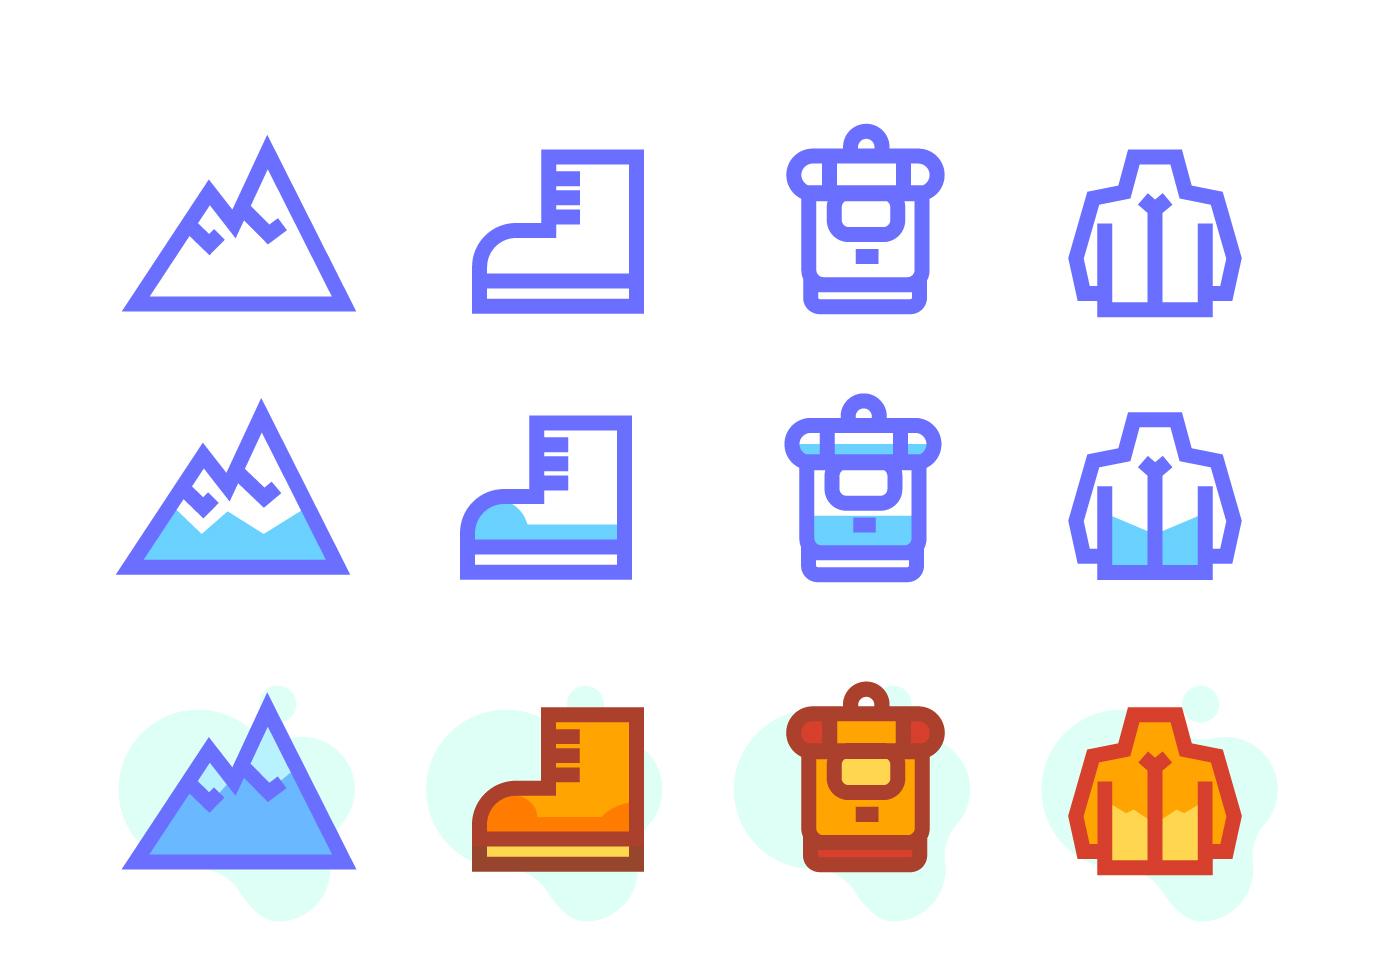 1400x980 Matterhorn Icon Guide